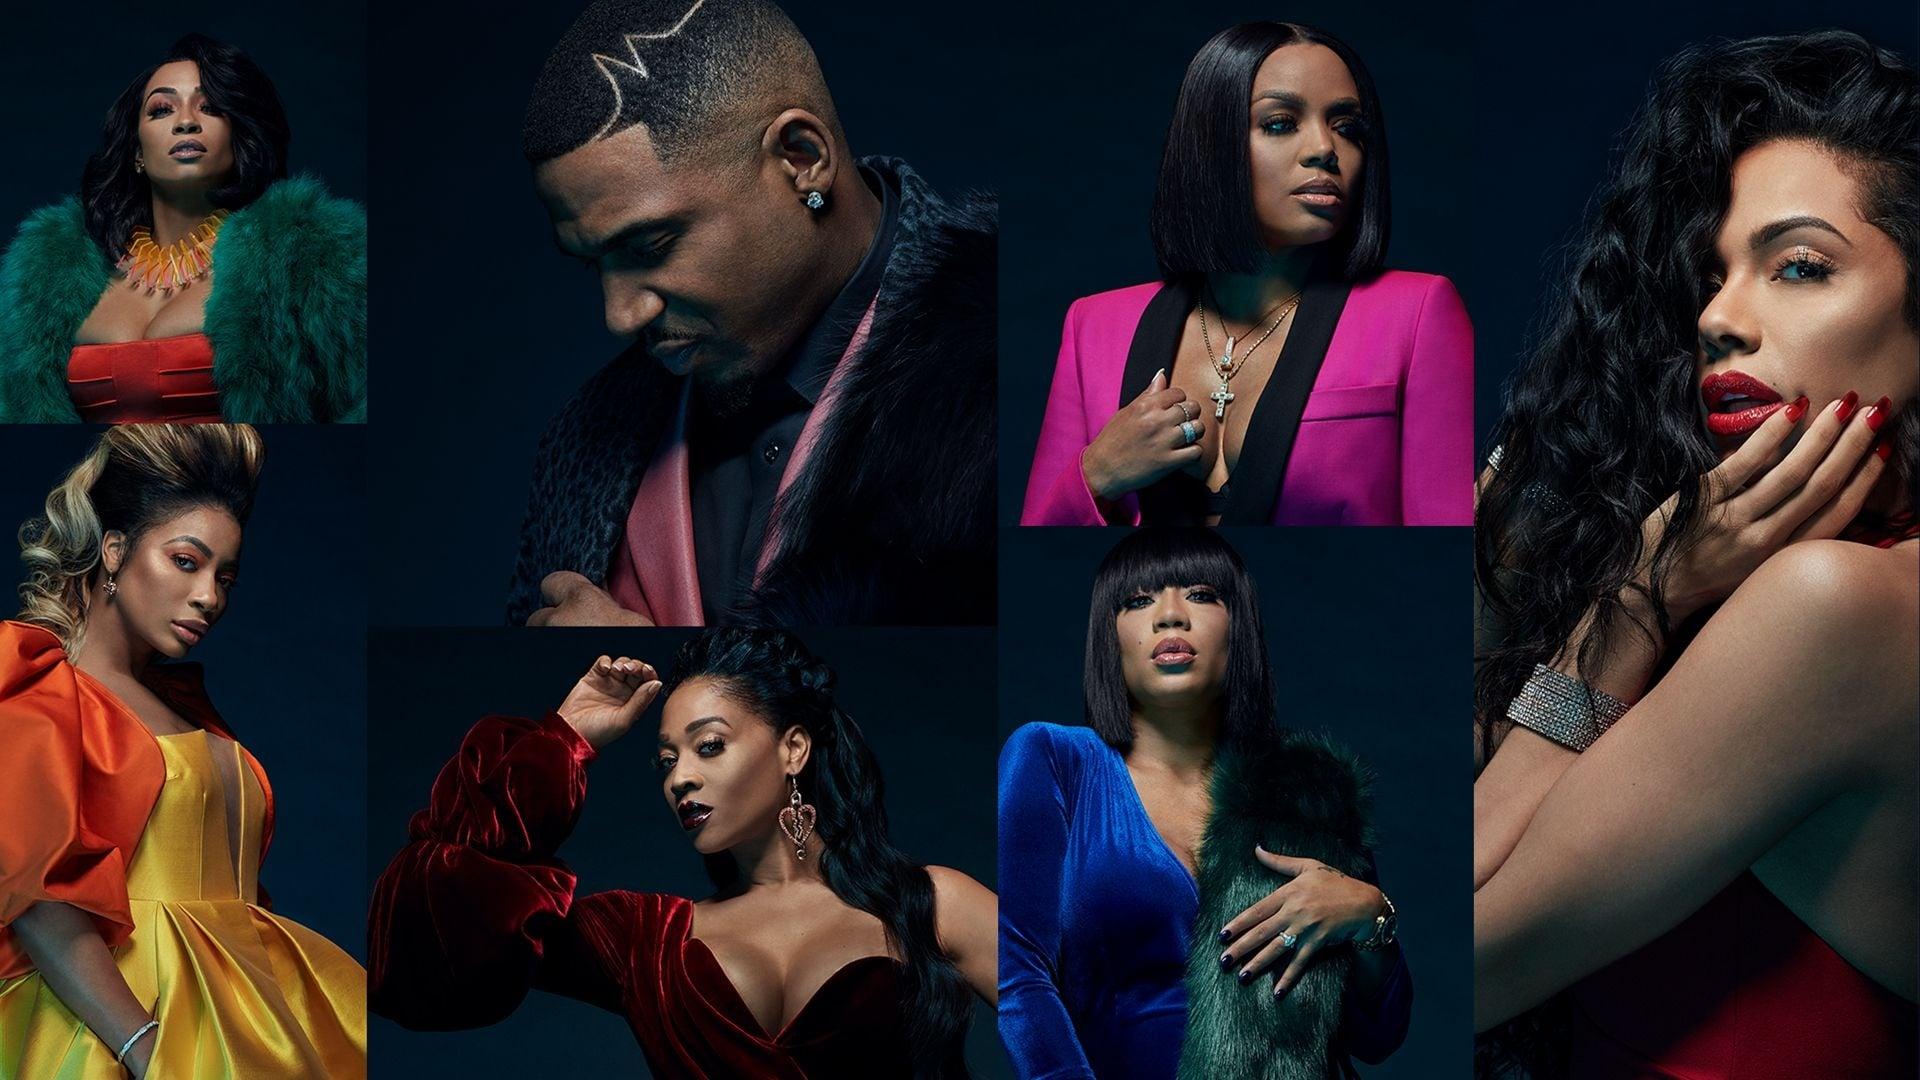 Love & Hip Hop Atlanta Season 10 Episode 11